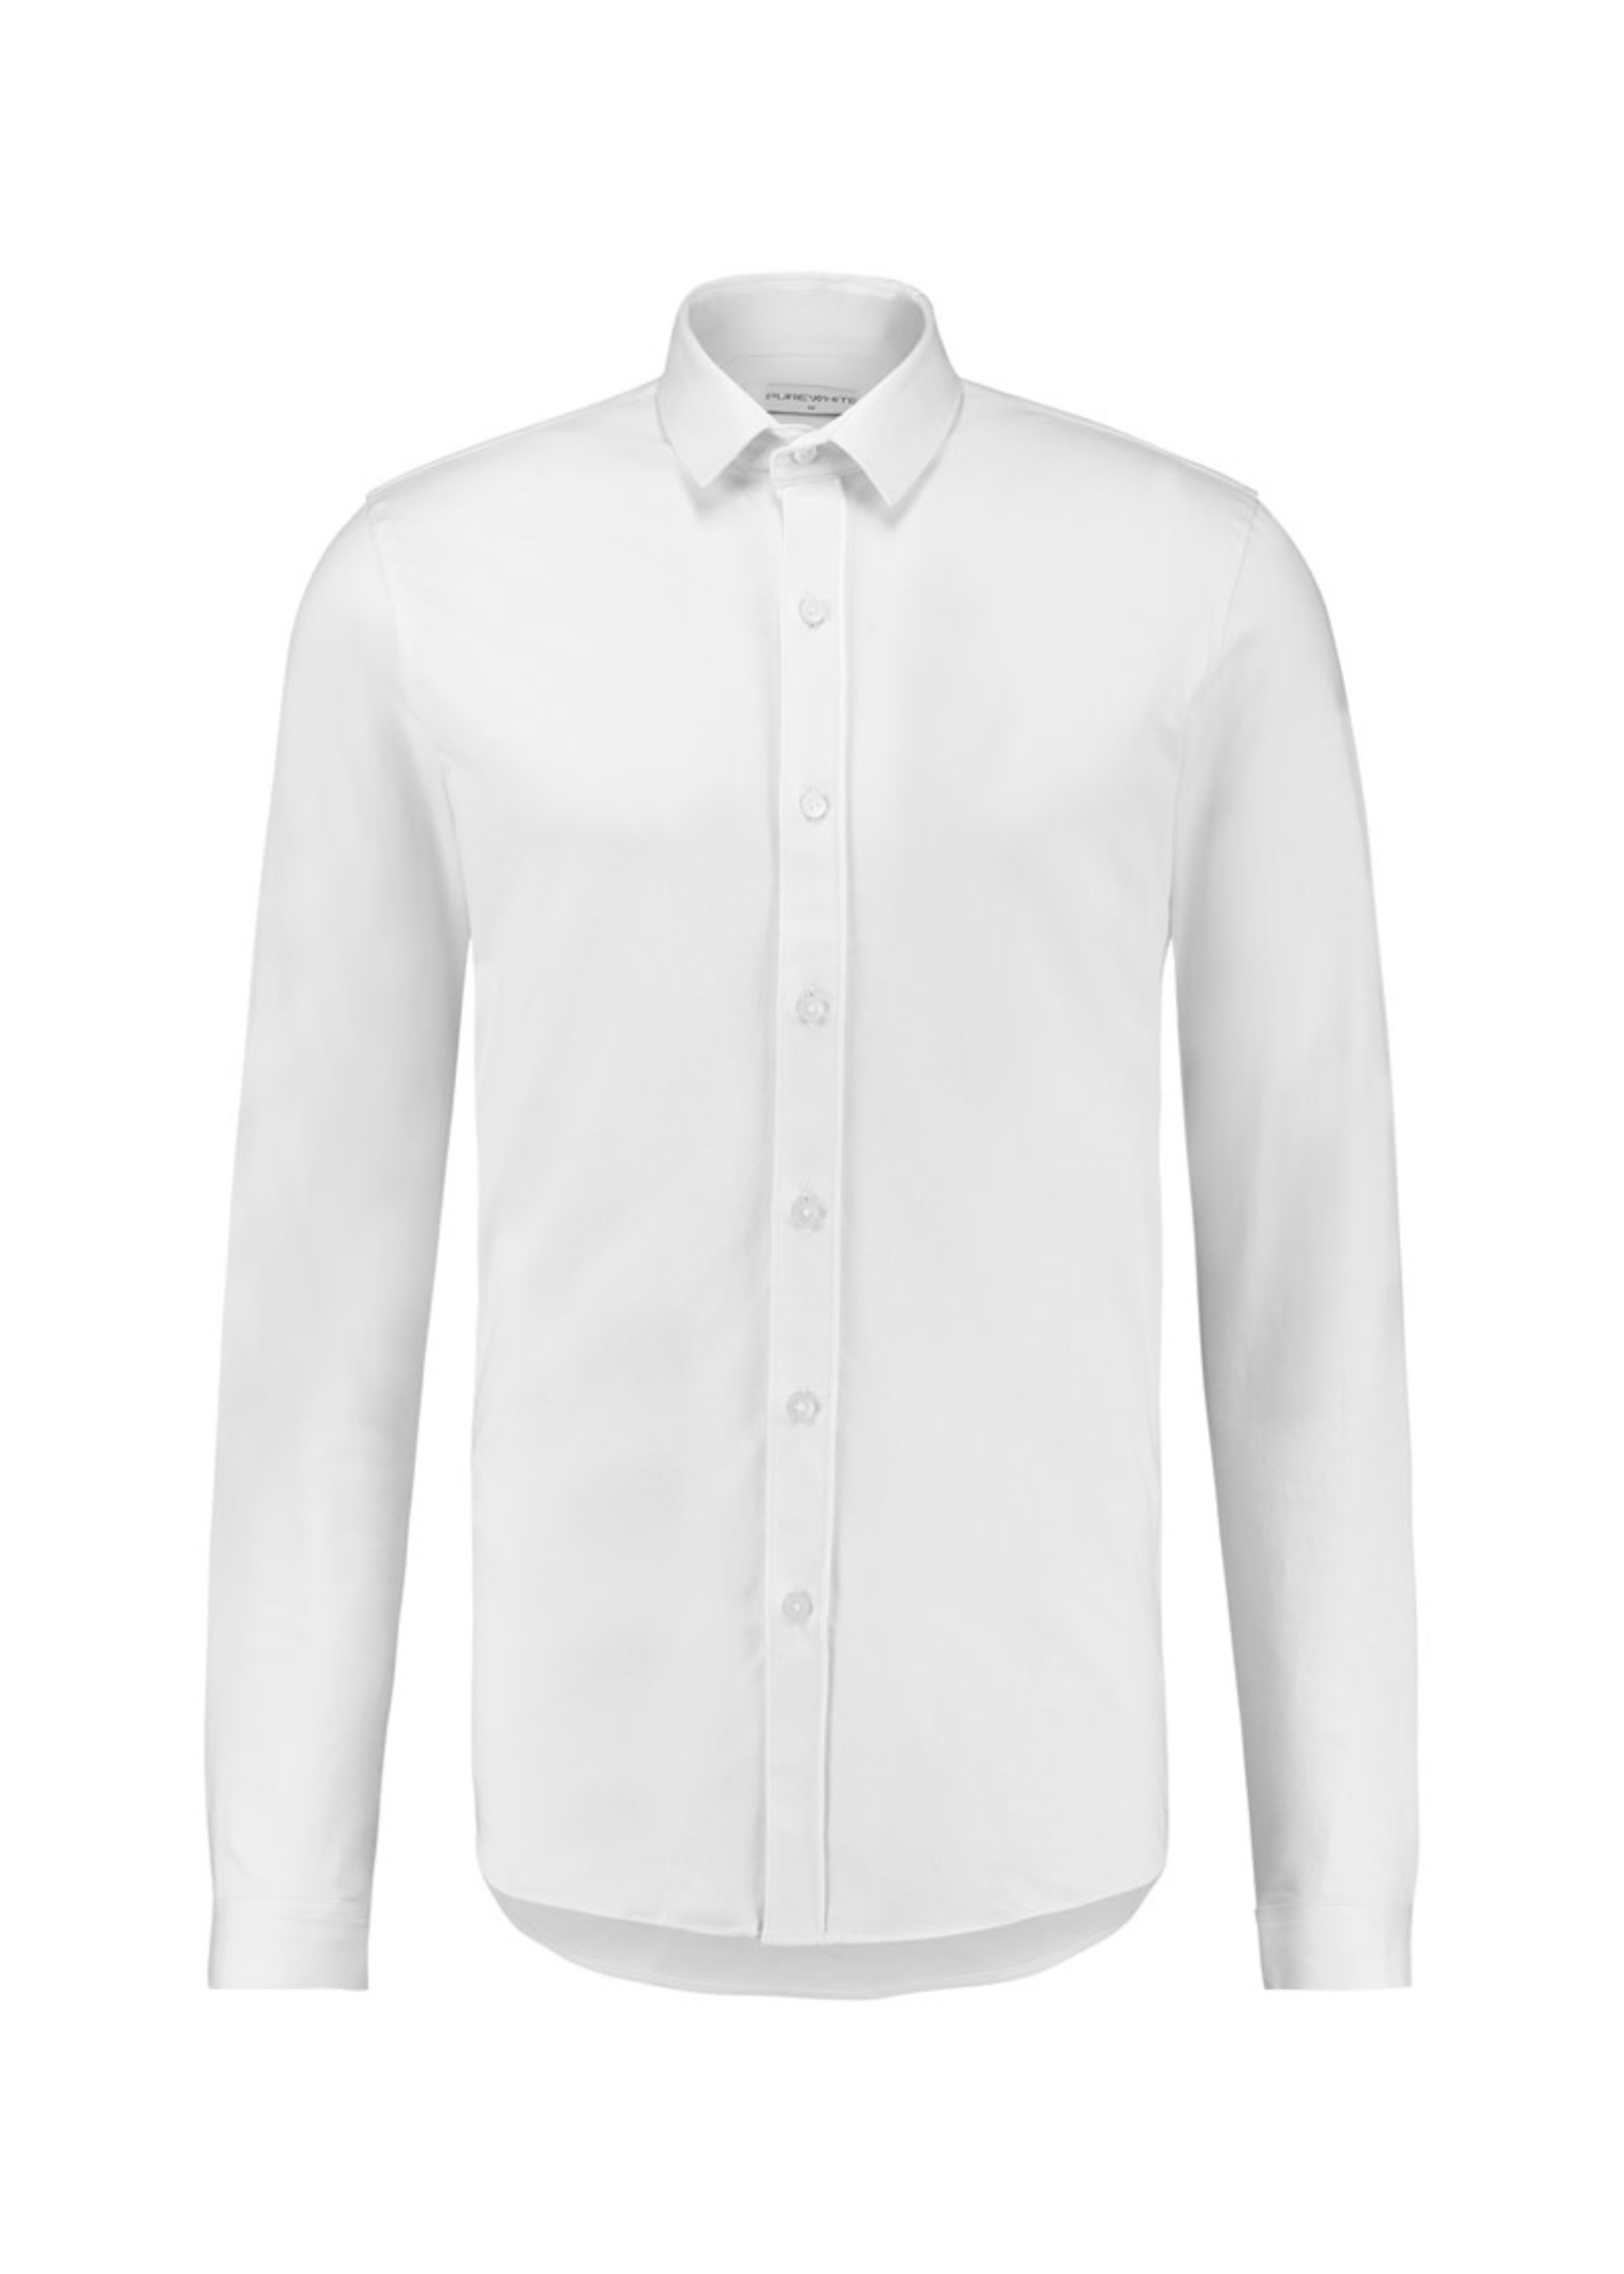 Purewhite Purewhite Essential Shirt - White